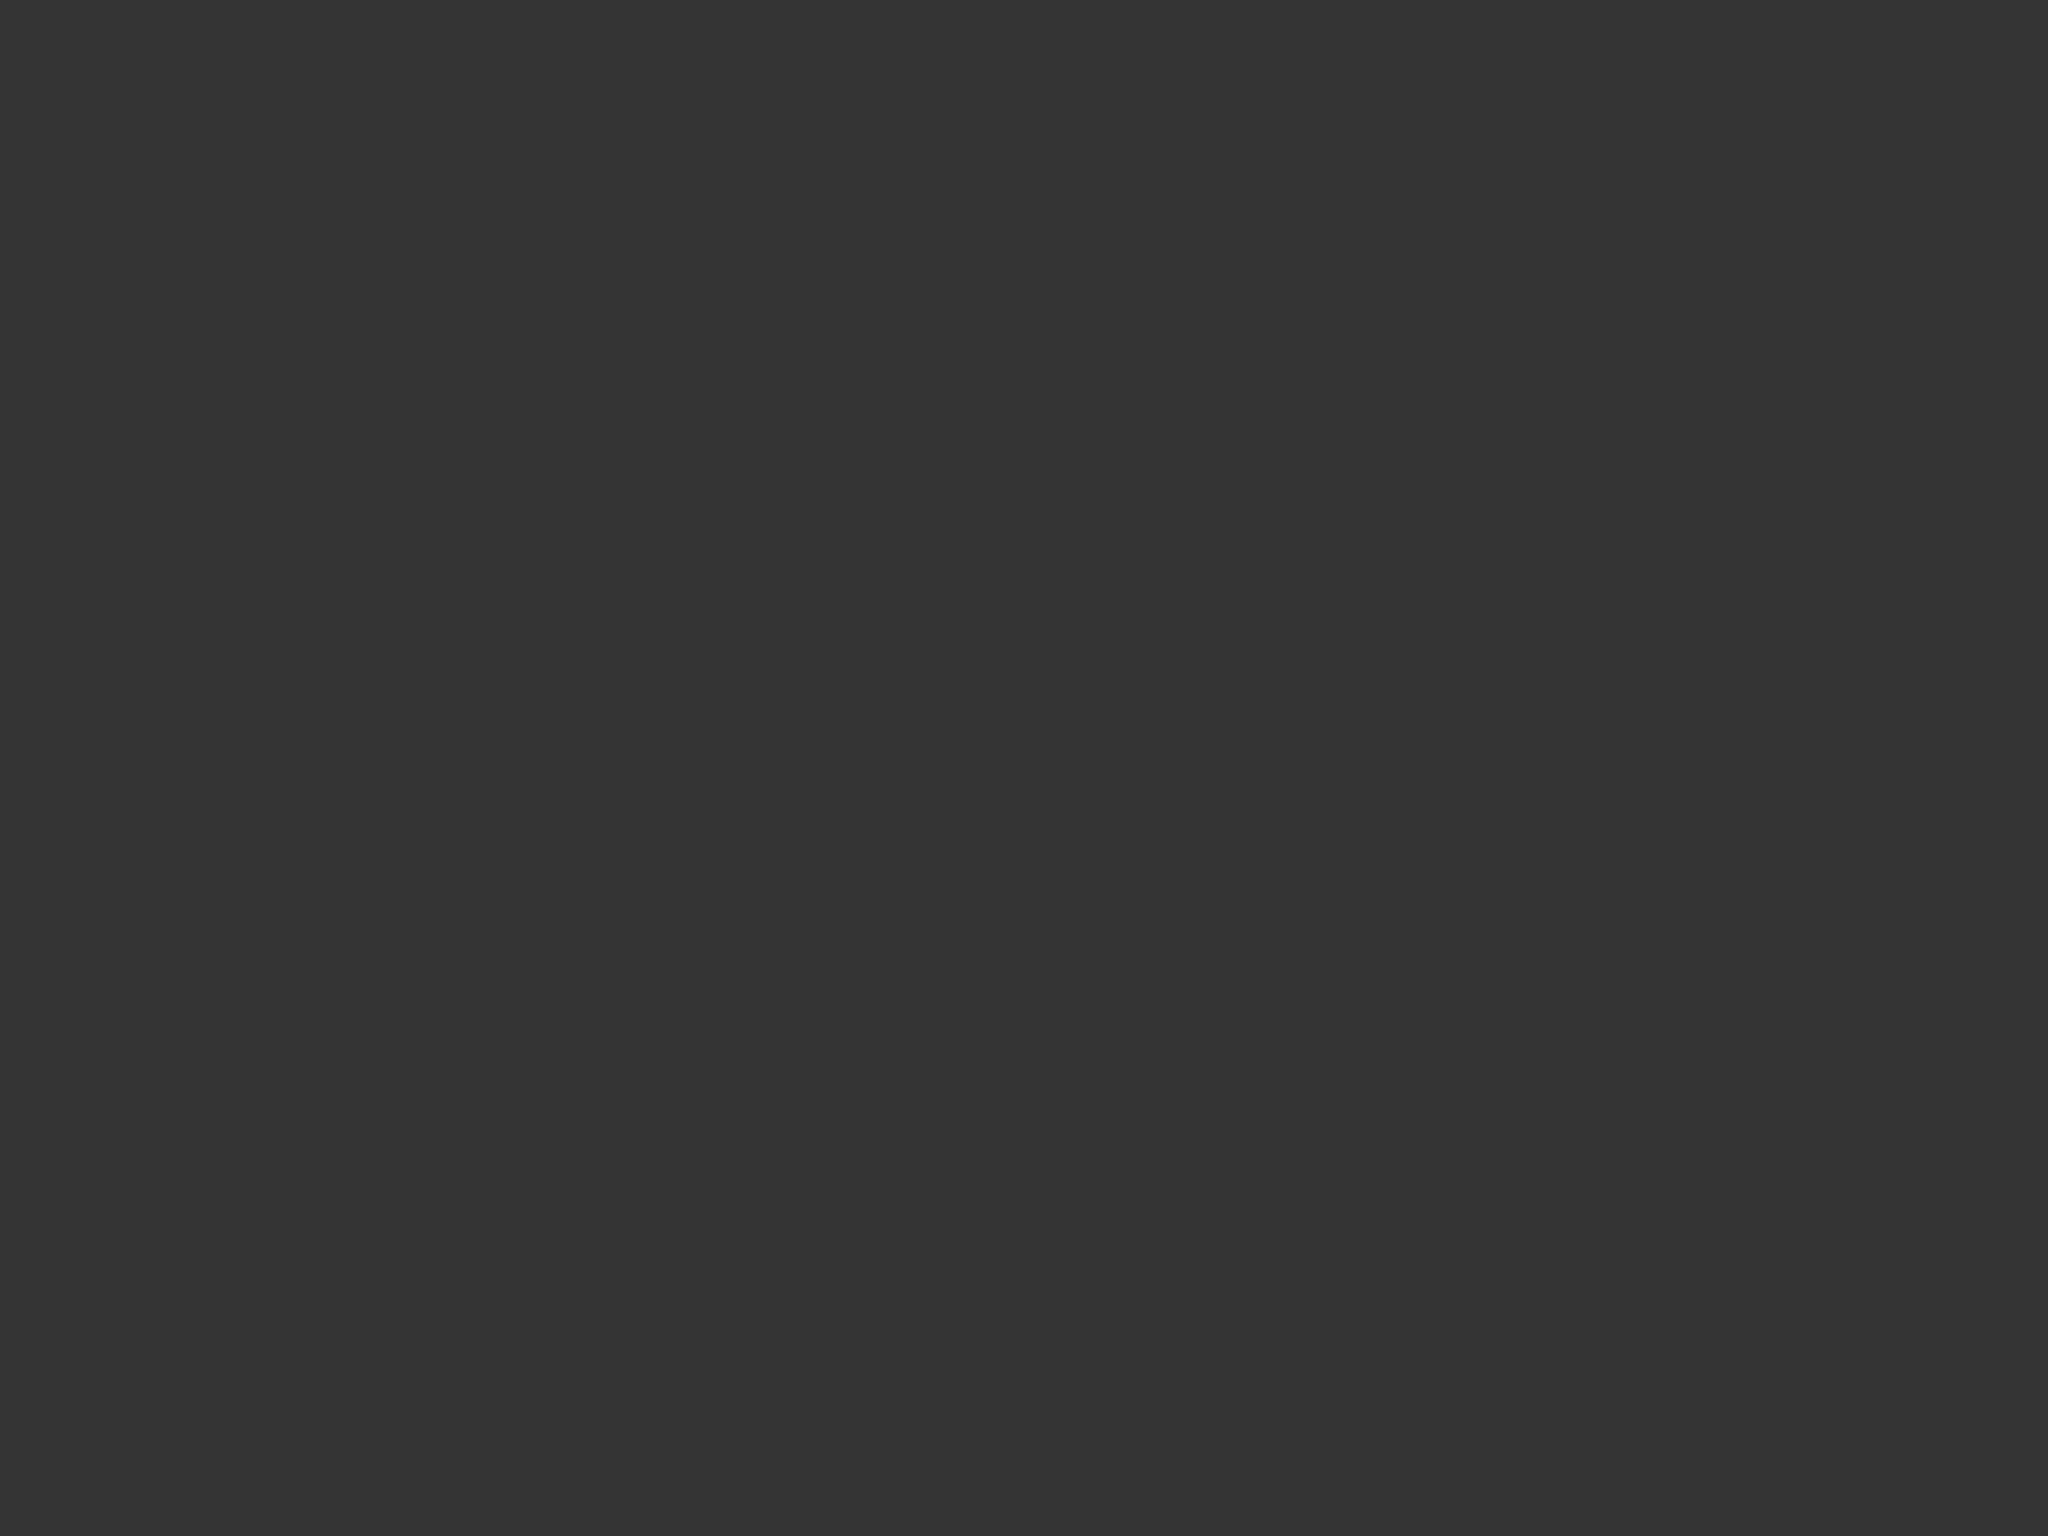 2048x1536 Jet Solid Color Background